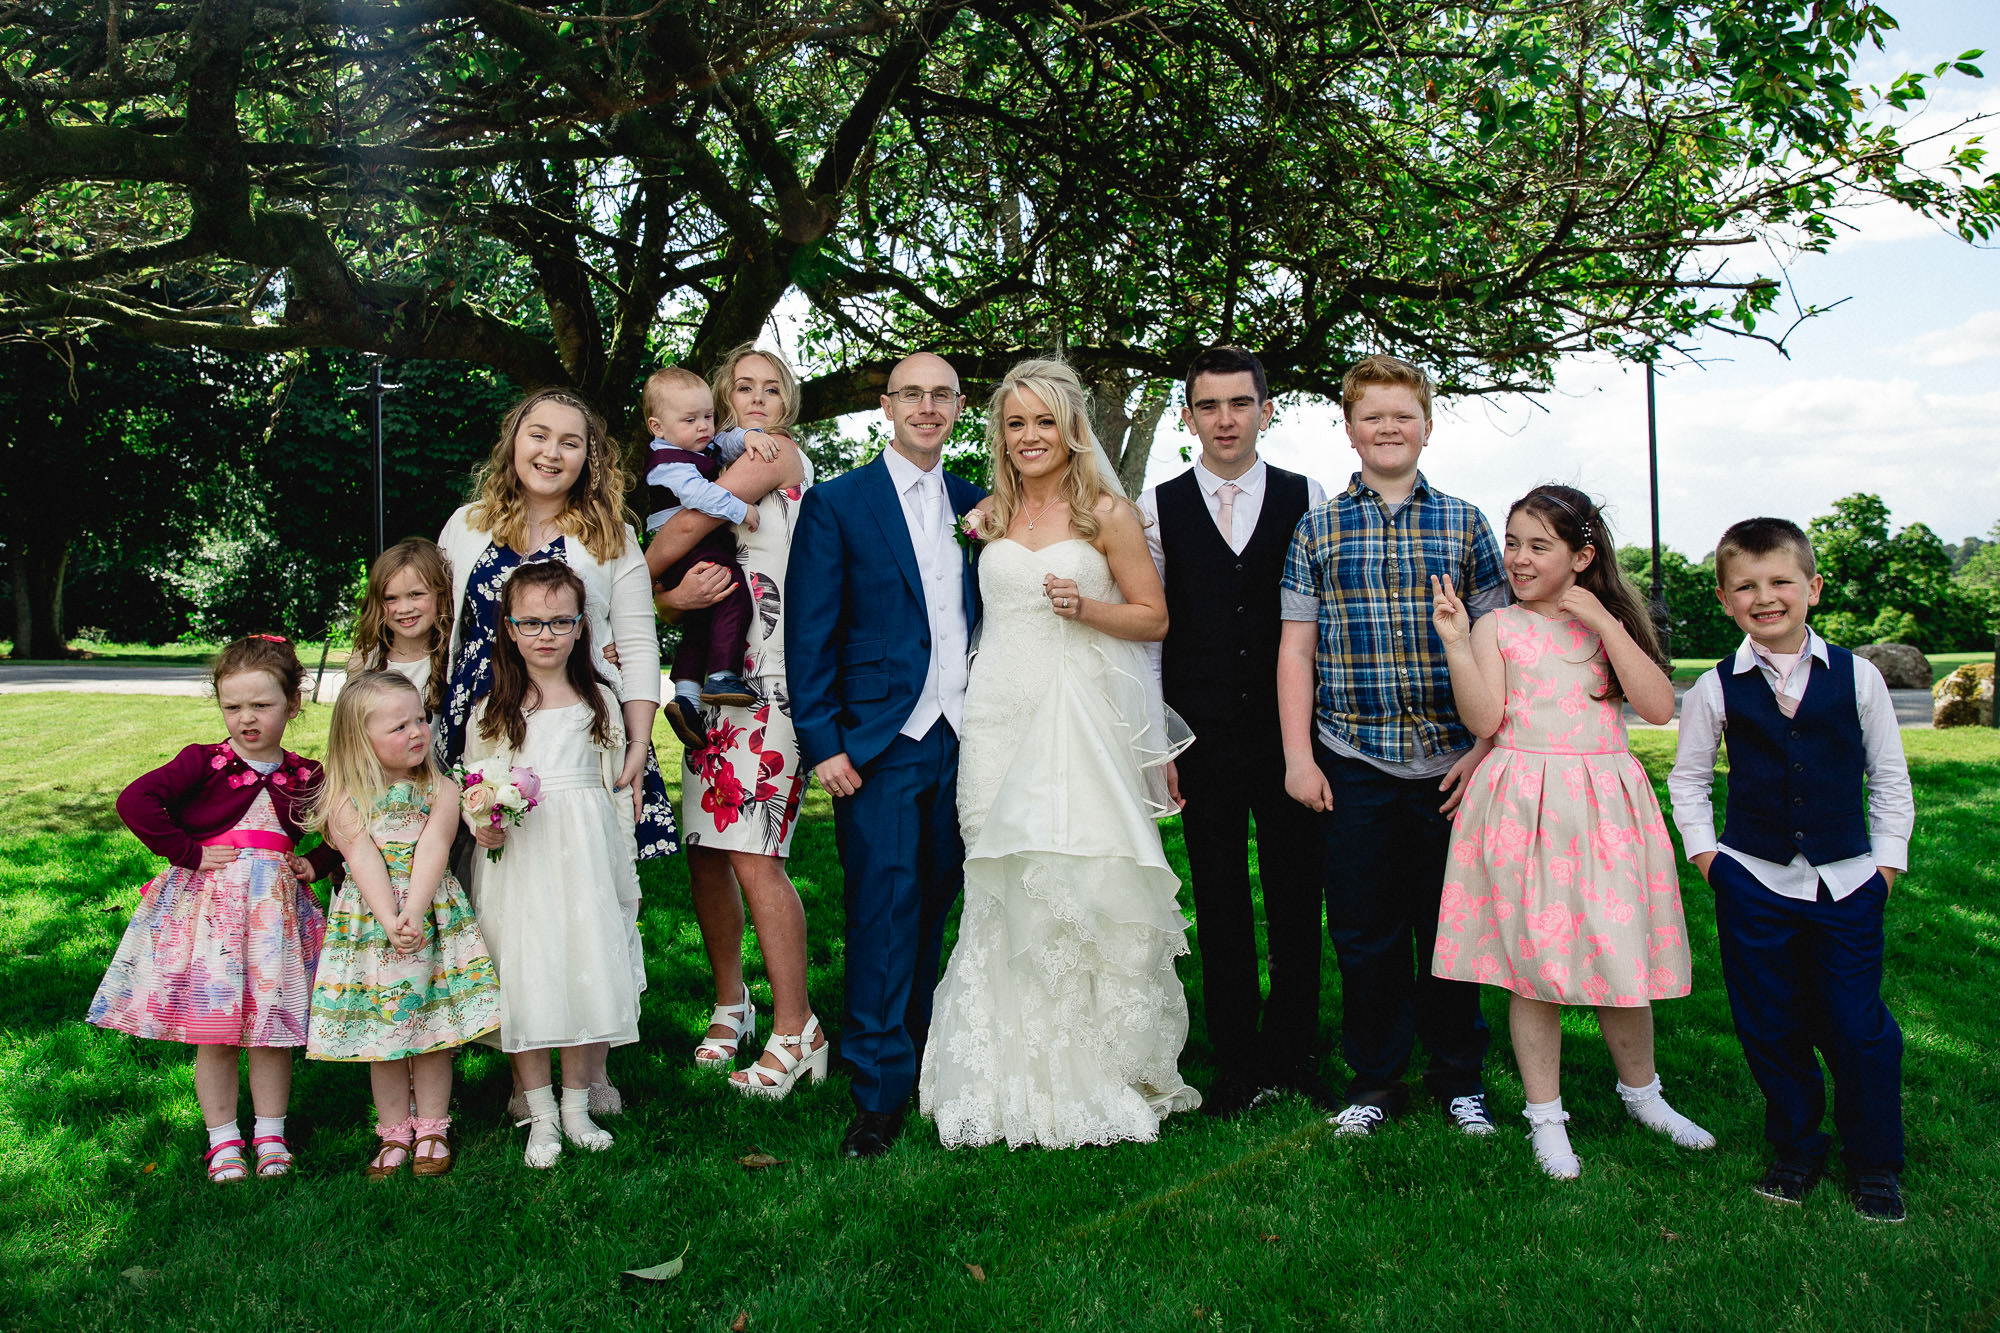 CLAIREBYRNEPHOTOGRAPHY-WEDDING-Ireland-tulffaris-alternative-fun-Lisa-terry-23.jpg